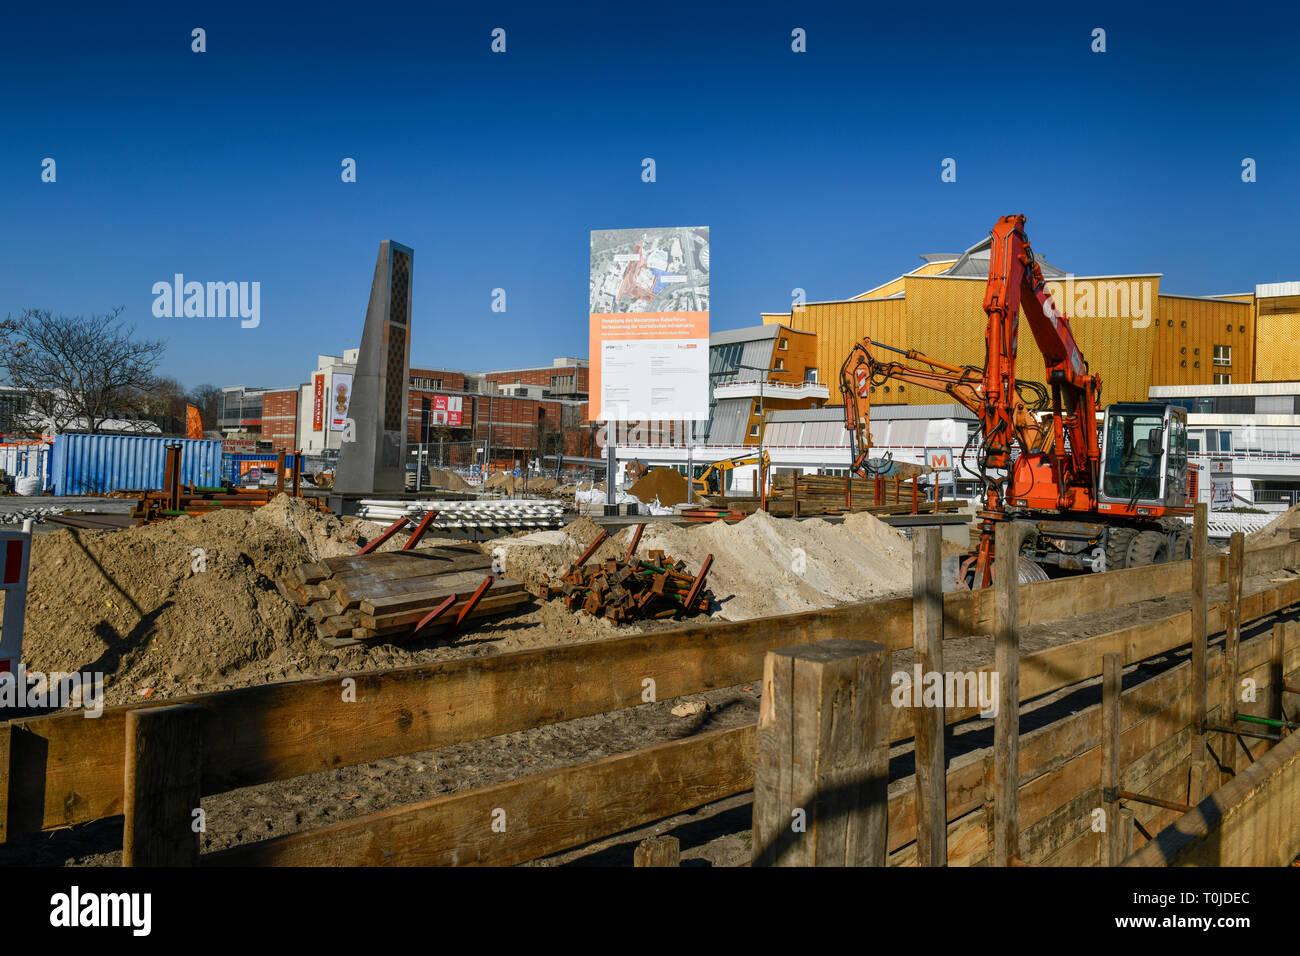 Construction works, cultural forum, Potsdam street, zoo, middle, Berlin, Germany, Bauarbeiten, Kulturforum, Potsdamer Straße, Tiergarten, Mitte, Deuts - Stock Image